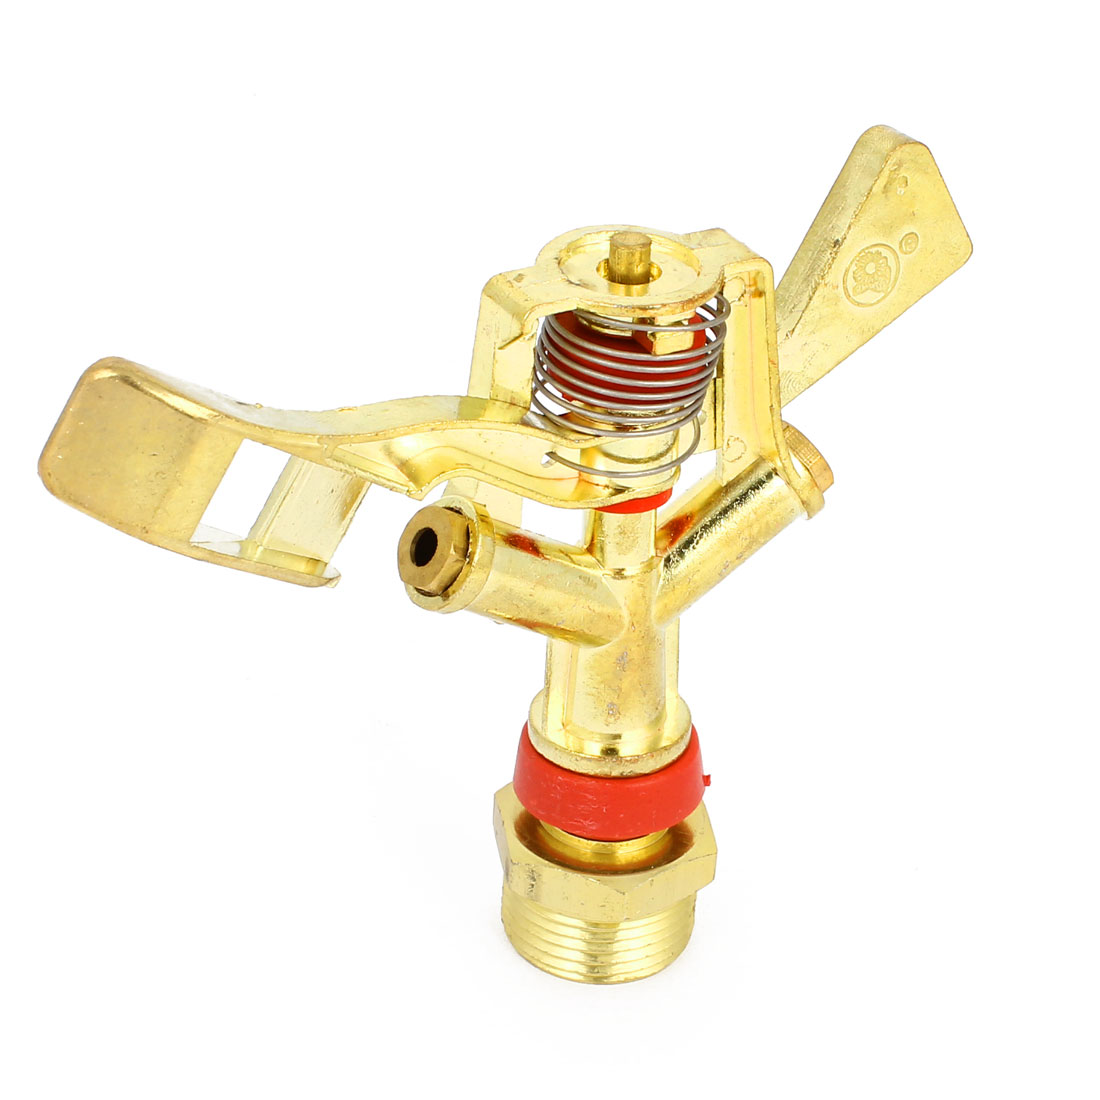 Adjustable Metal Lawn Sprayer Nozzle 3/4 PT 10-20m Spraying Diameter